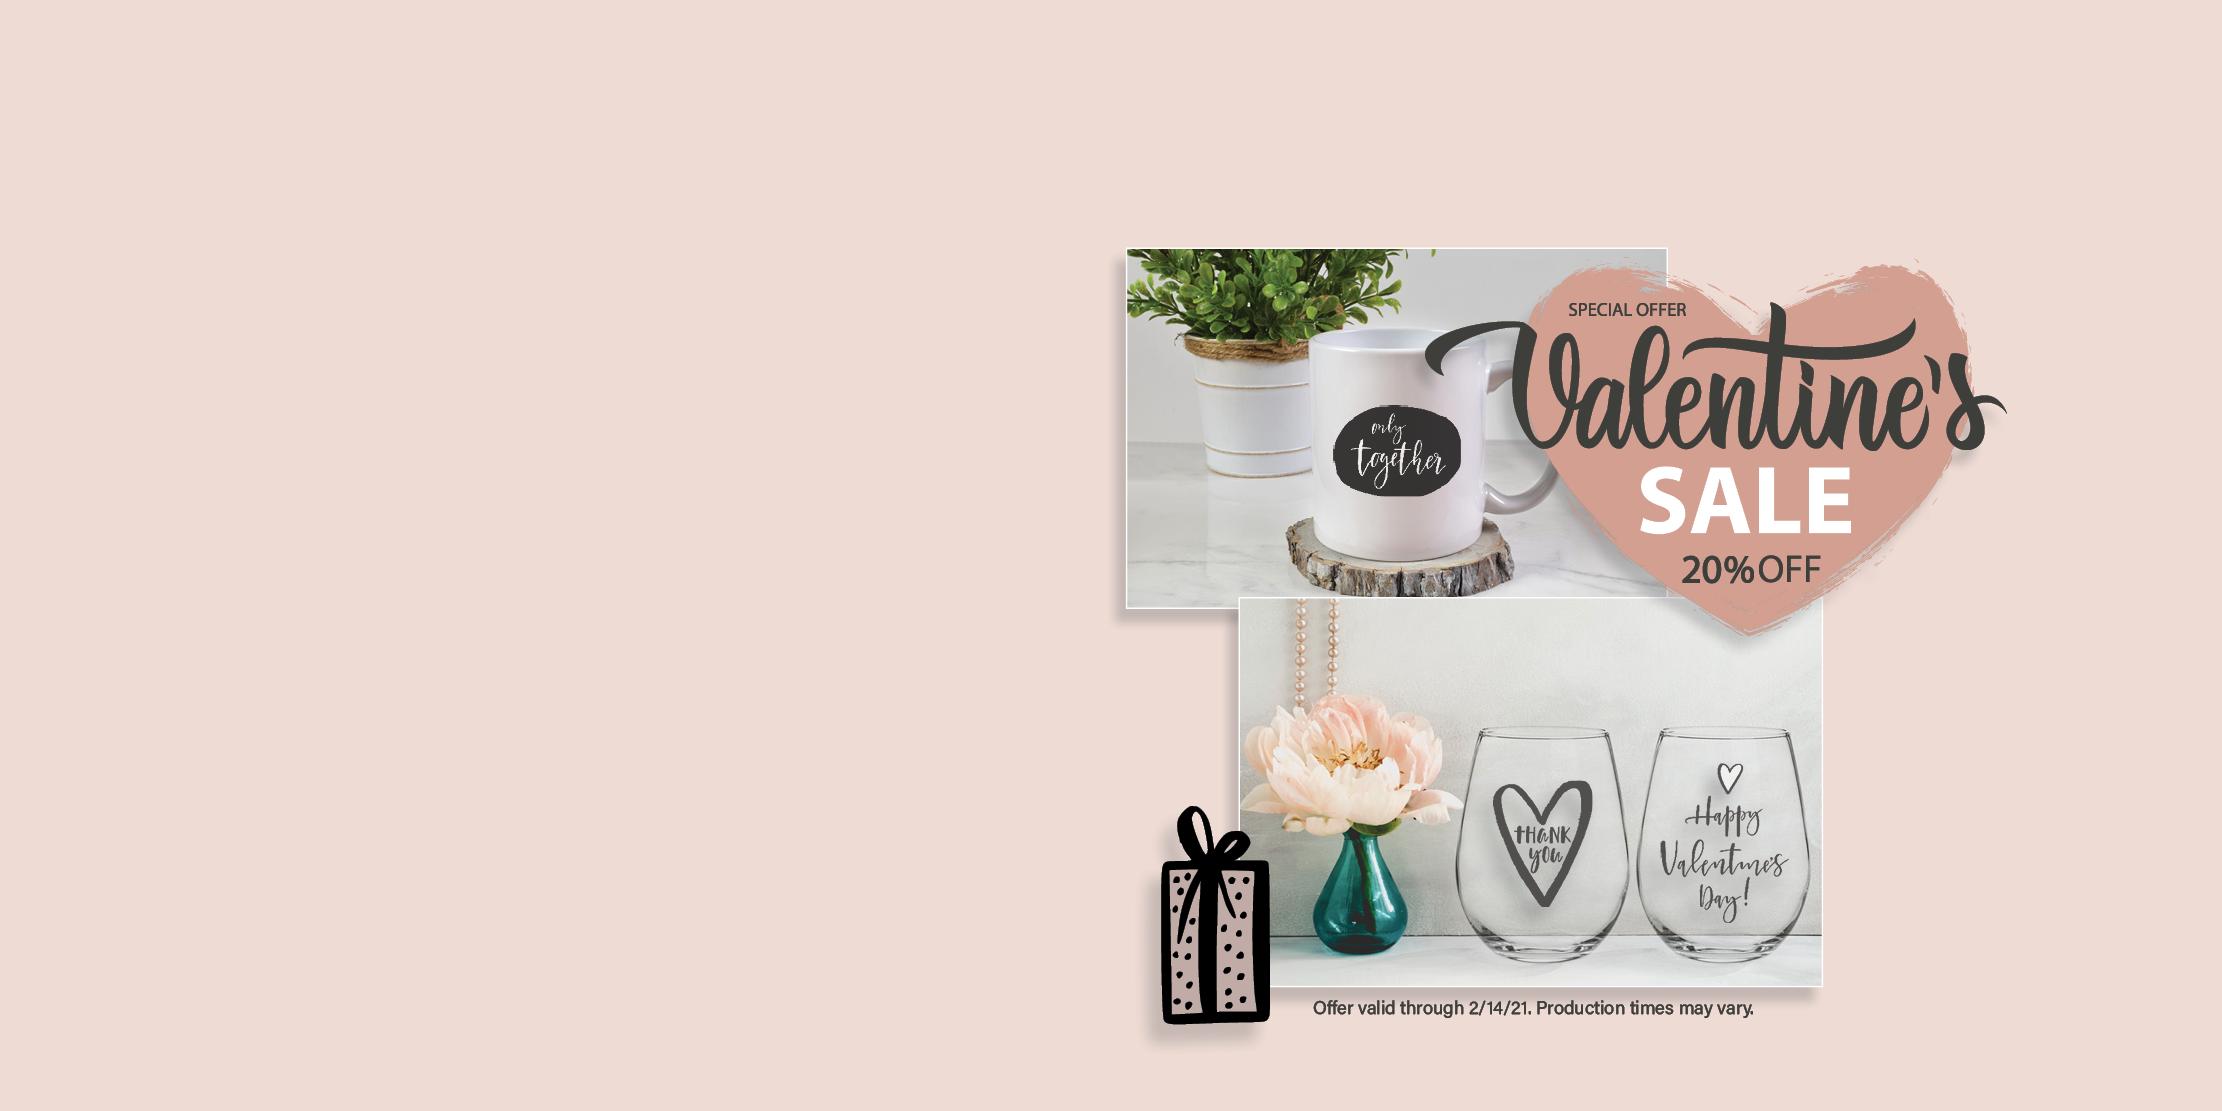 Valentine's Offer